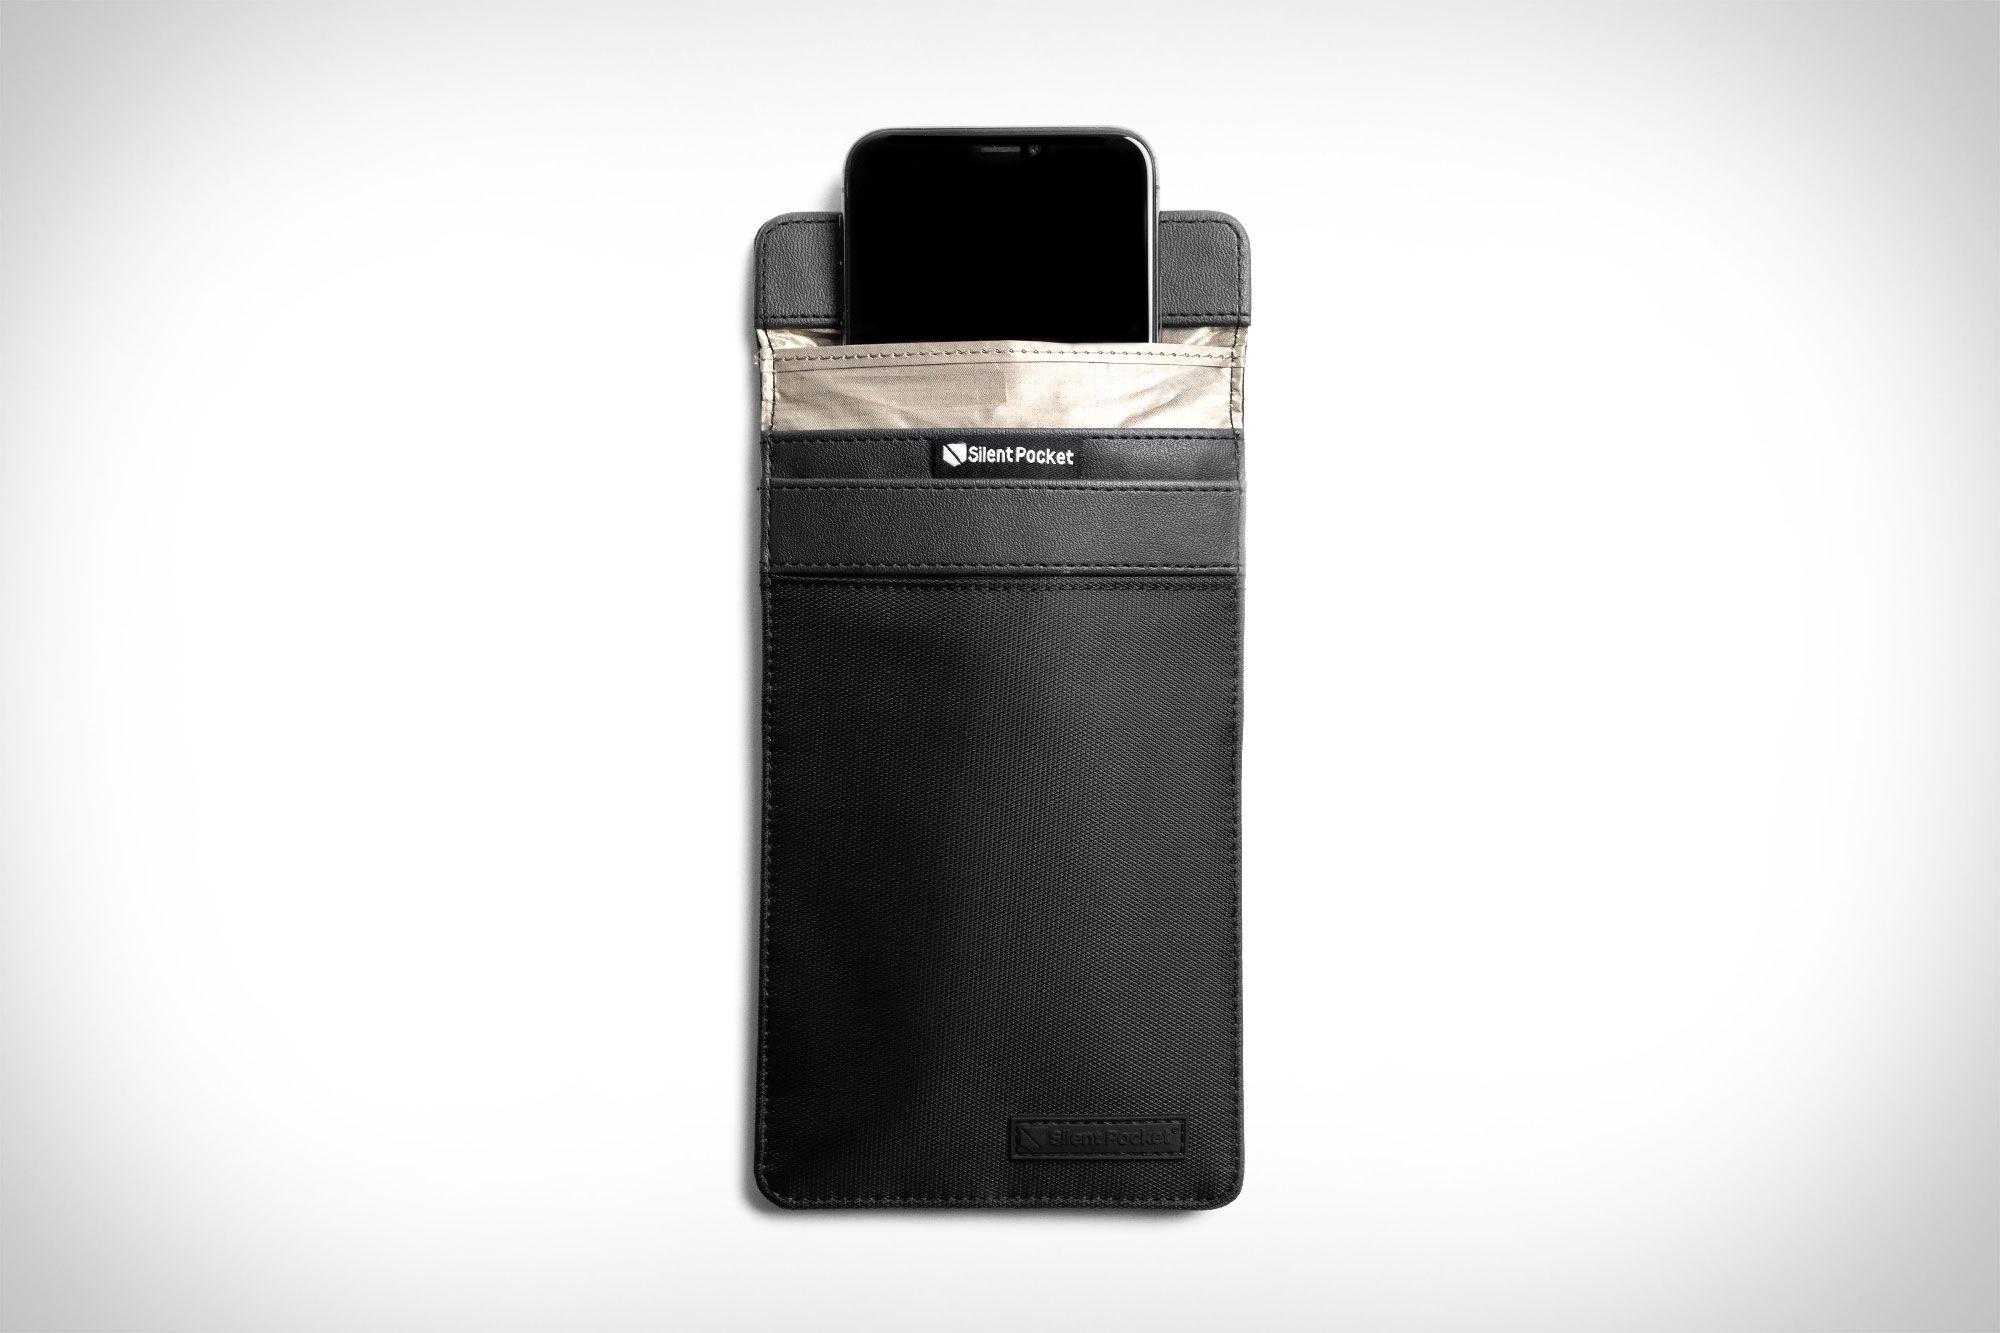 Silent Pocket Faraday Cases Case, Pocket, Uncrate